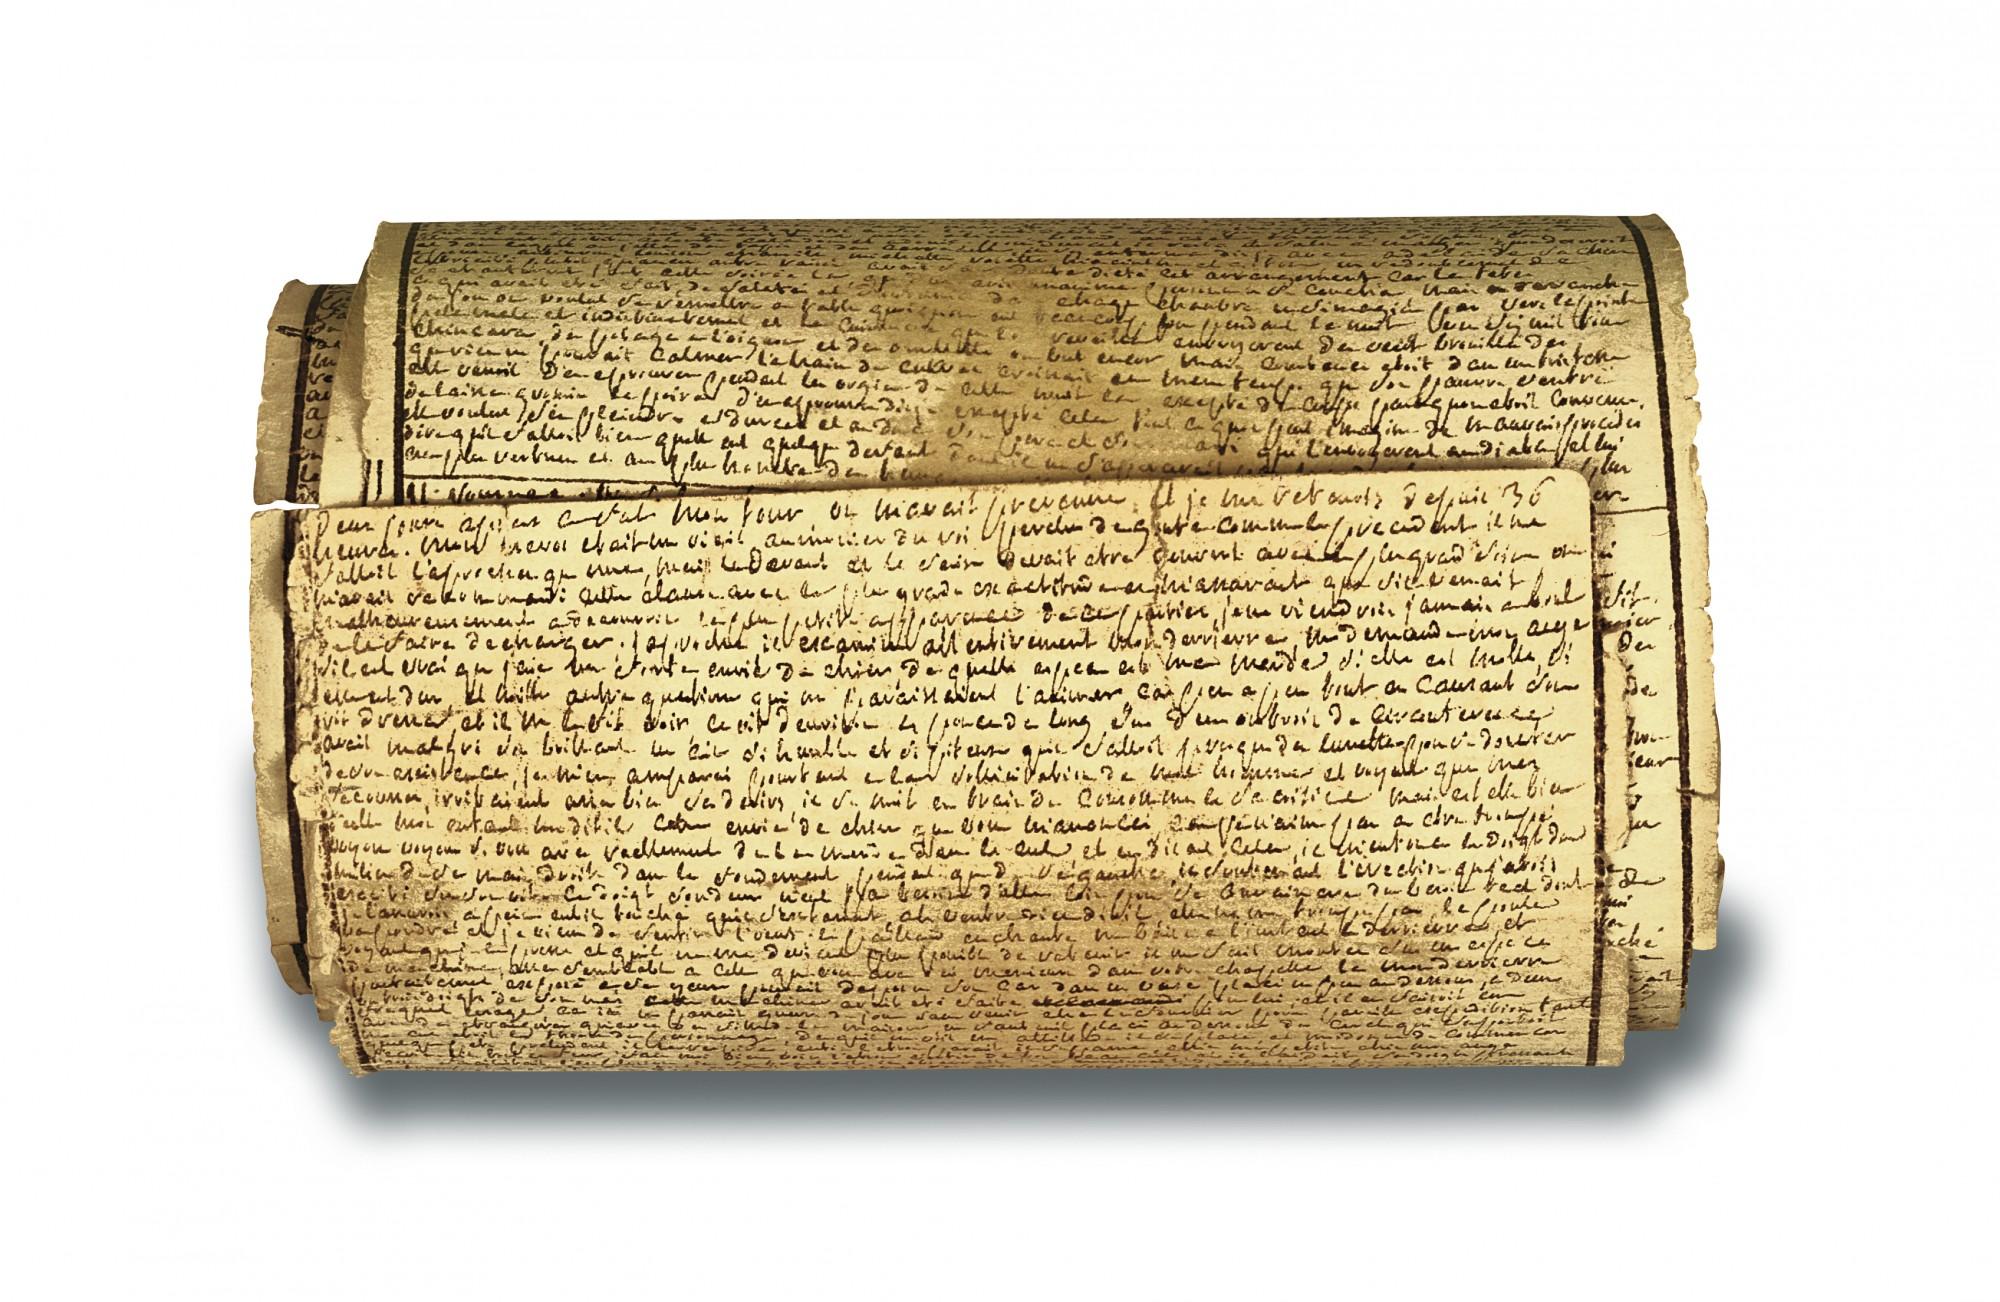 Manuscrit de Sade, © Fondation Martin Bodmer